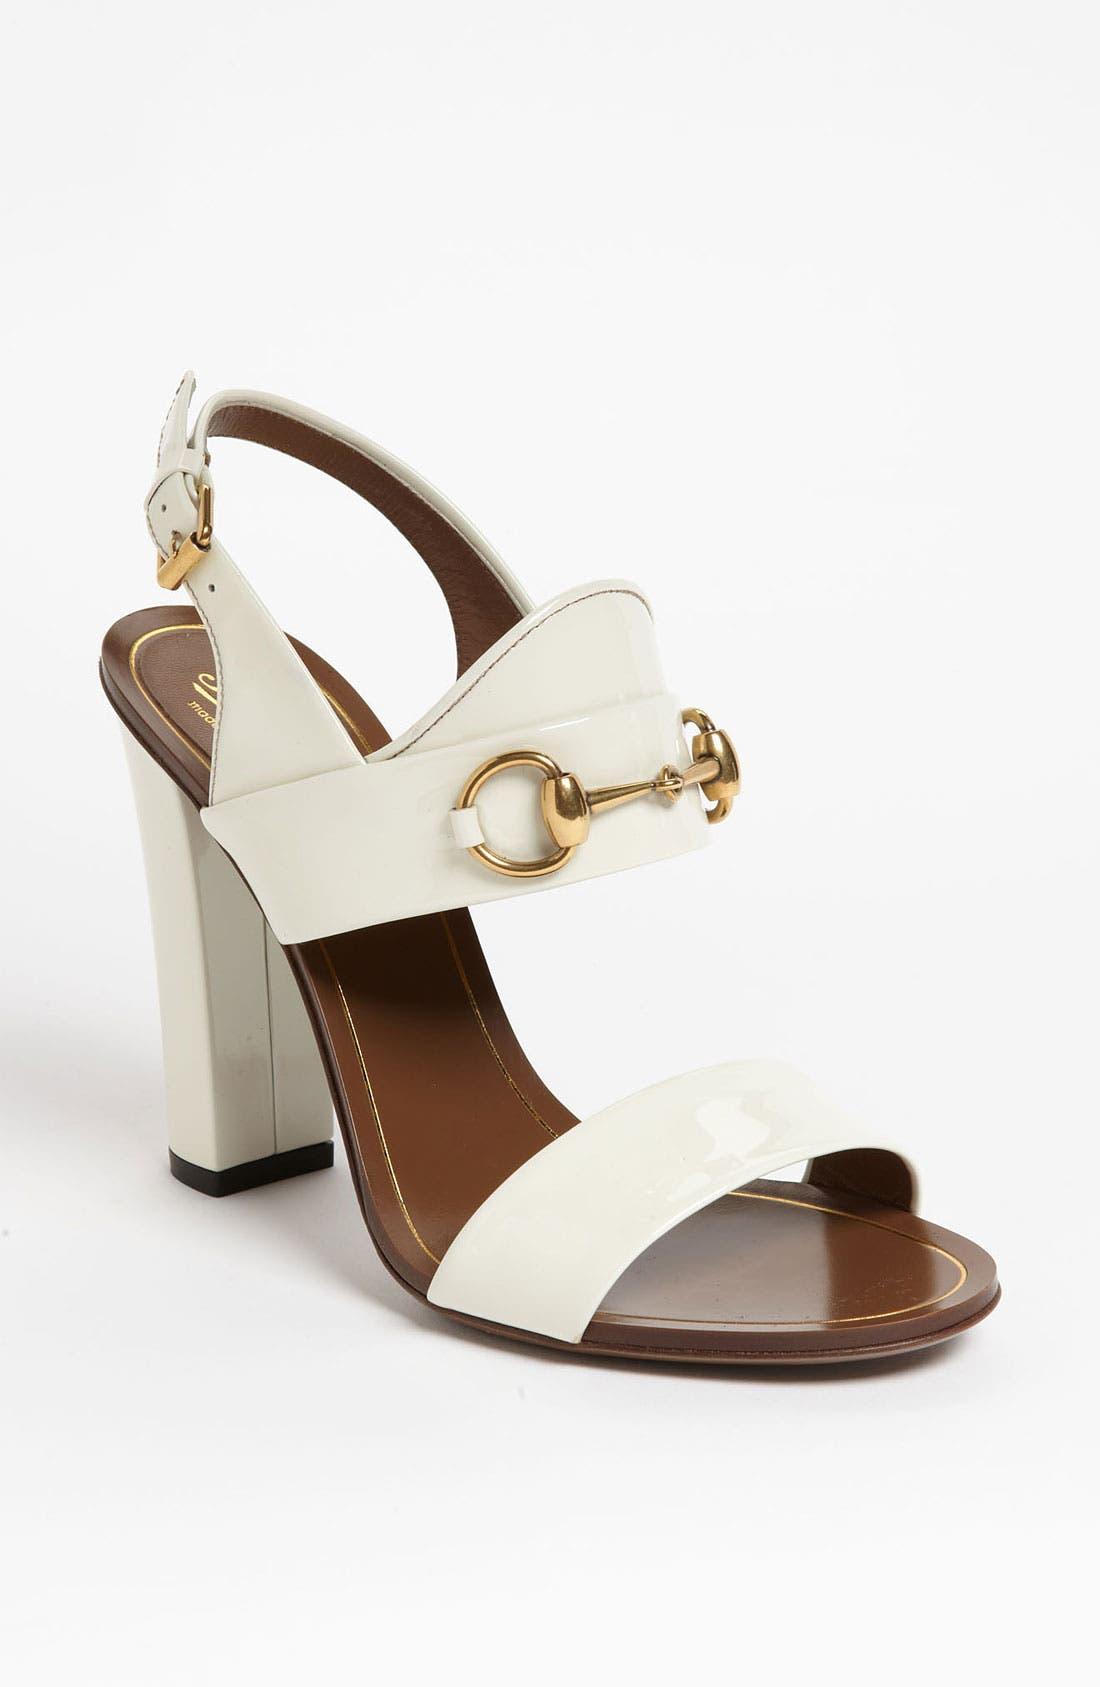 Main Image - Gucci 'Alyssa' Sandal